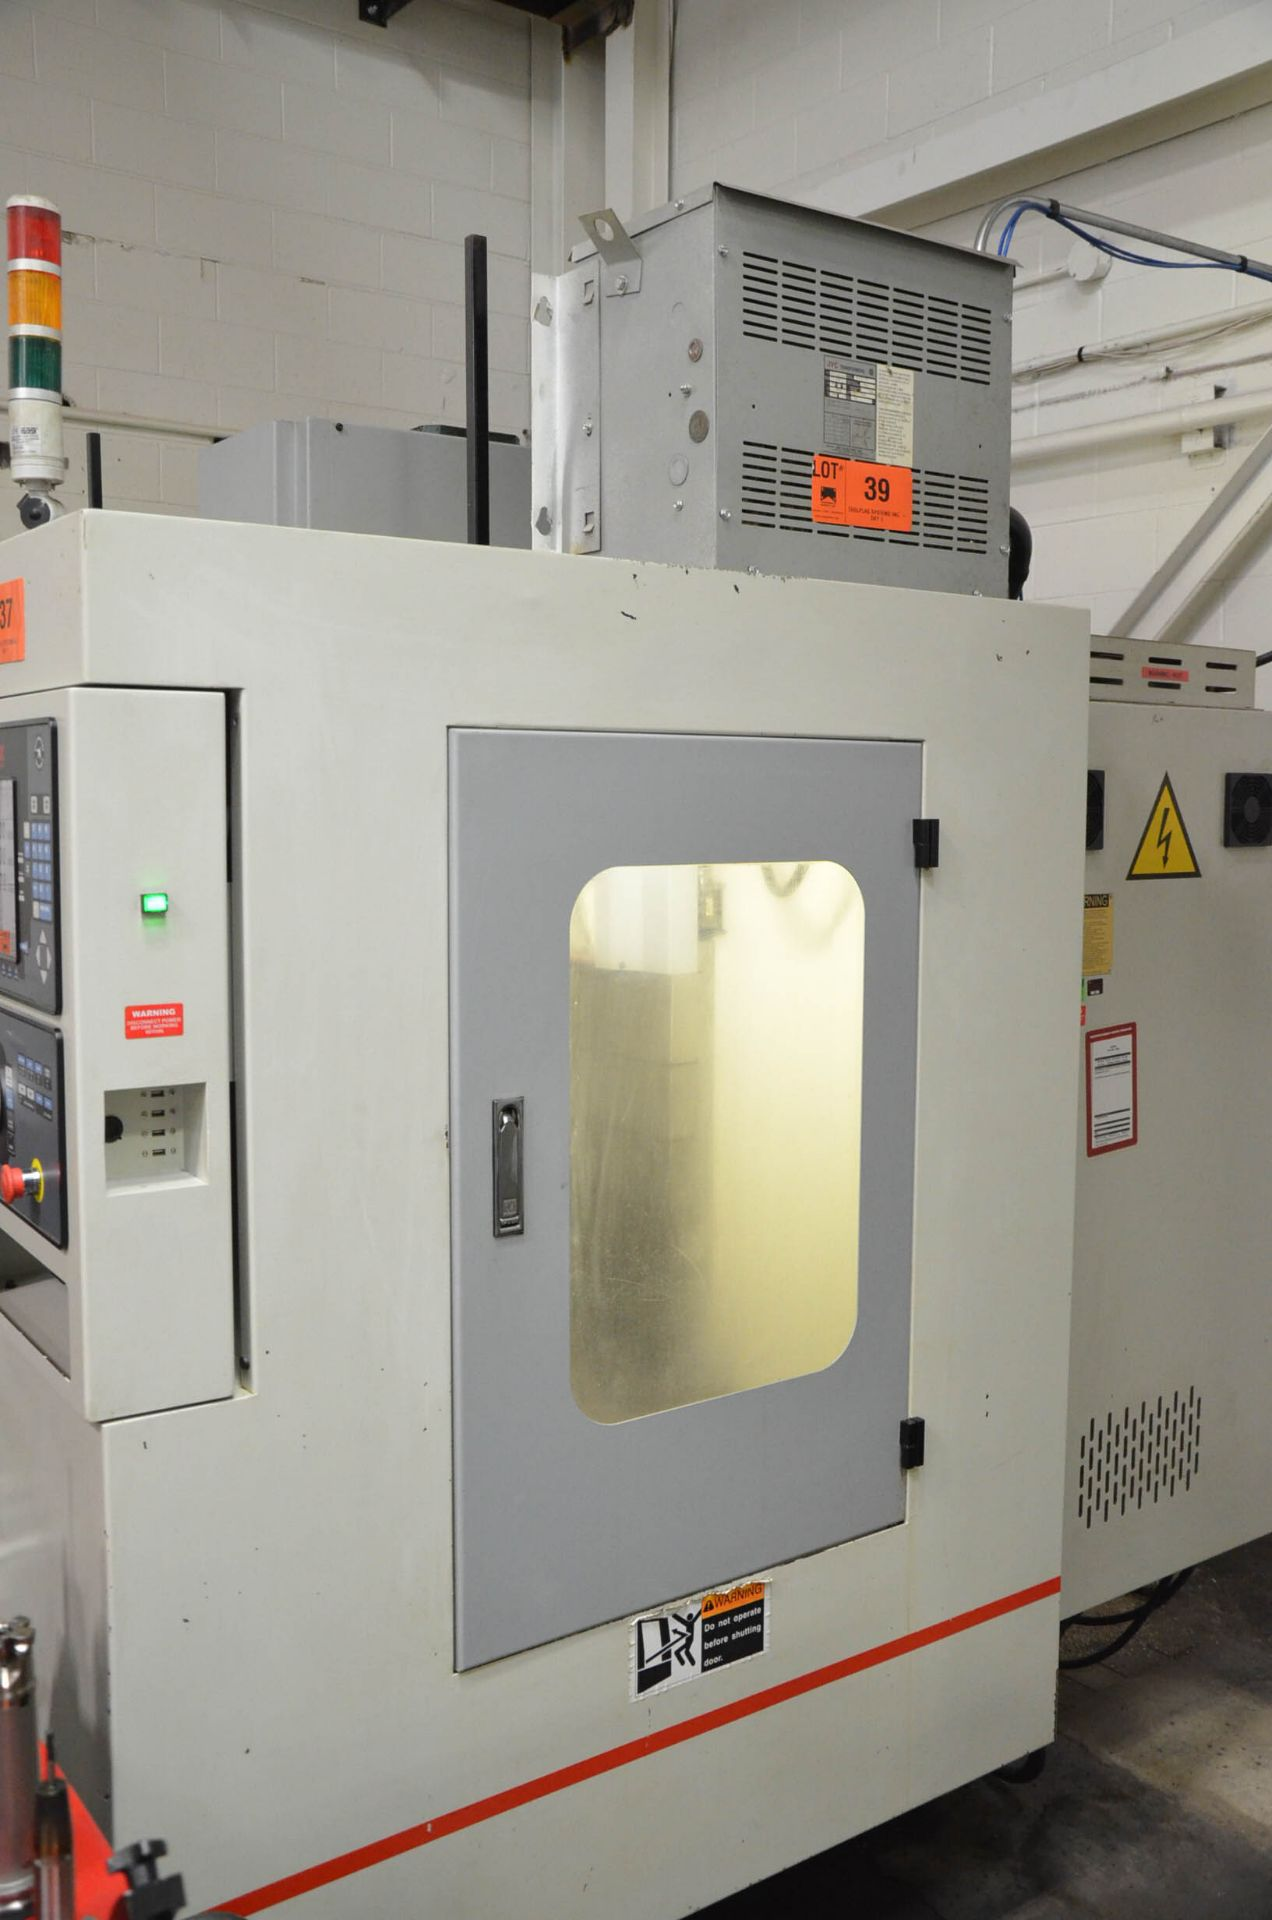 SWI (2012) TRAK LPM 4-AXIS READY CNC VERTICAL MACHINING CENTER WITH PROTO TRAK PMX CNC CONTROL, 19. - Image 3 of 10